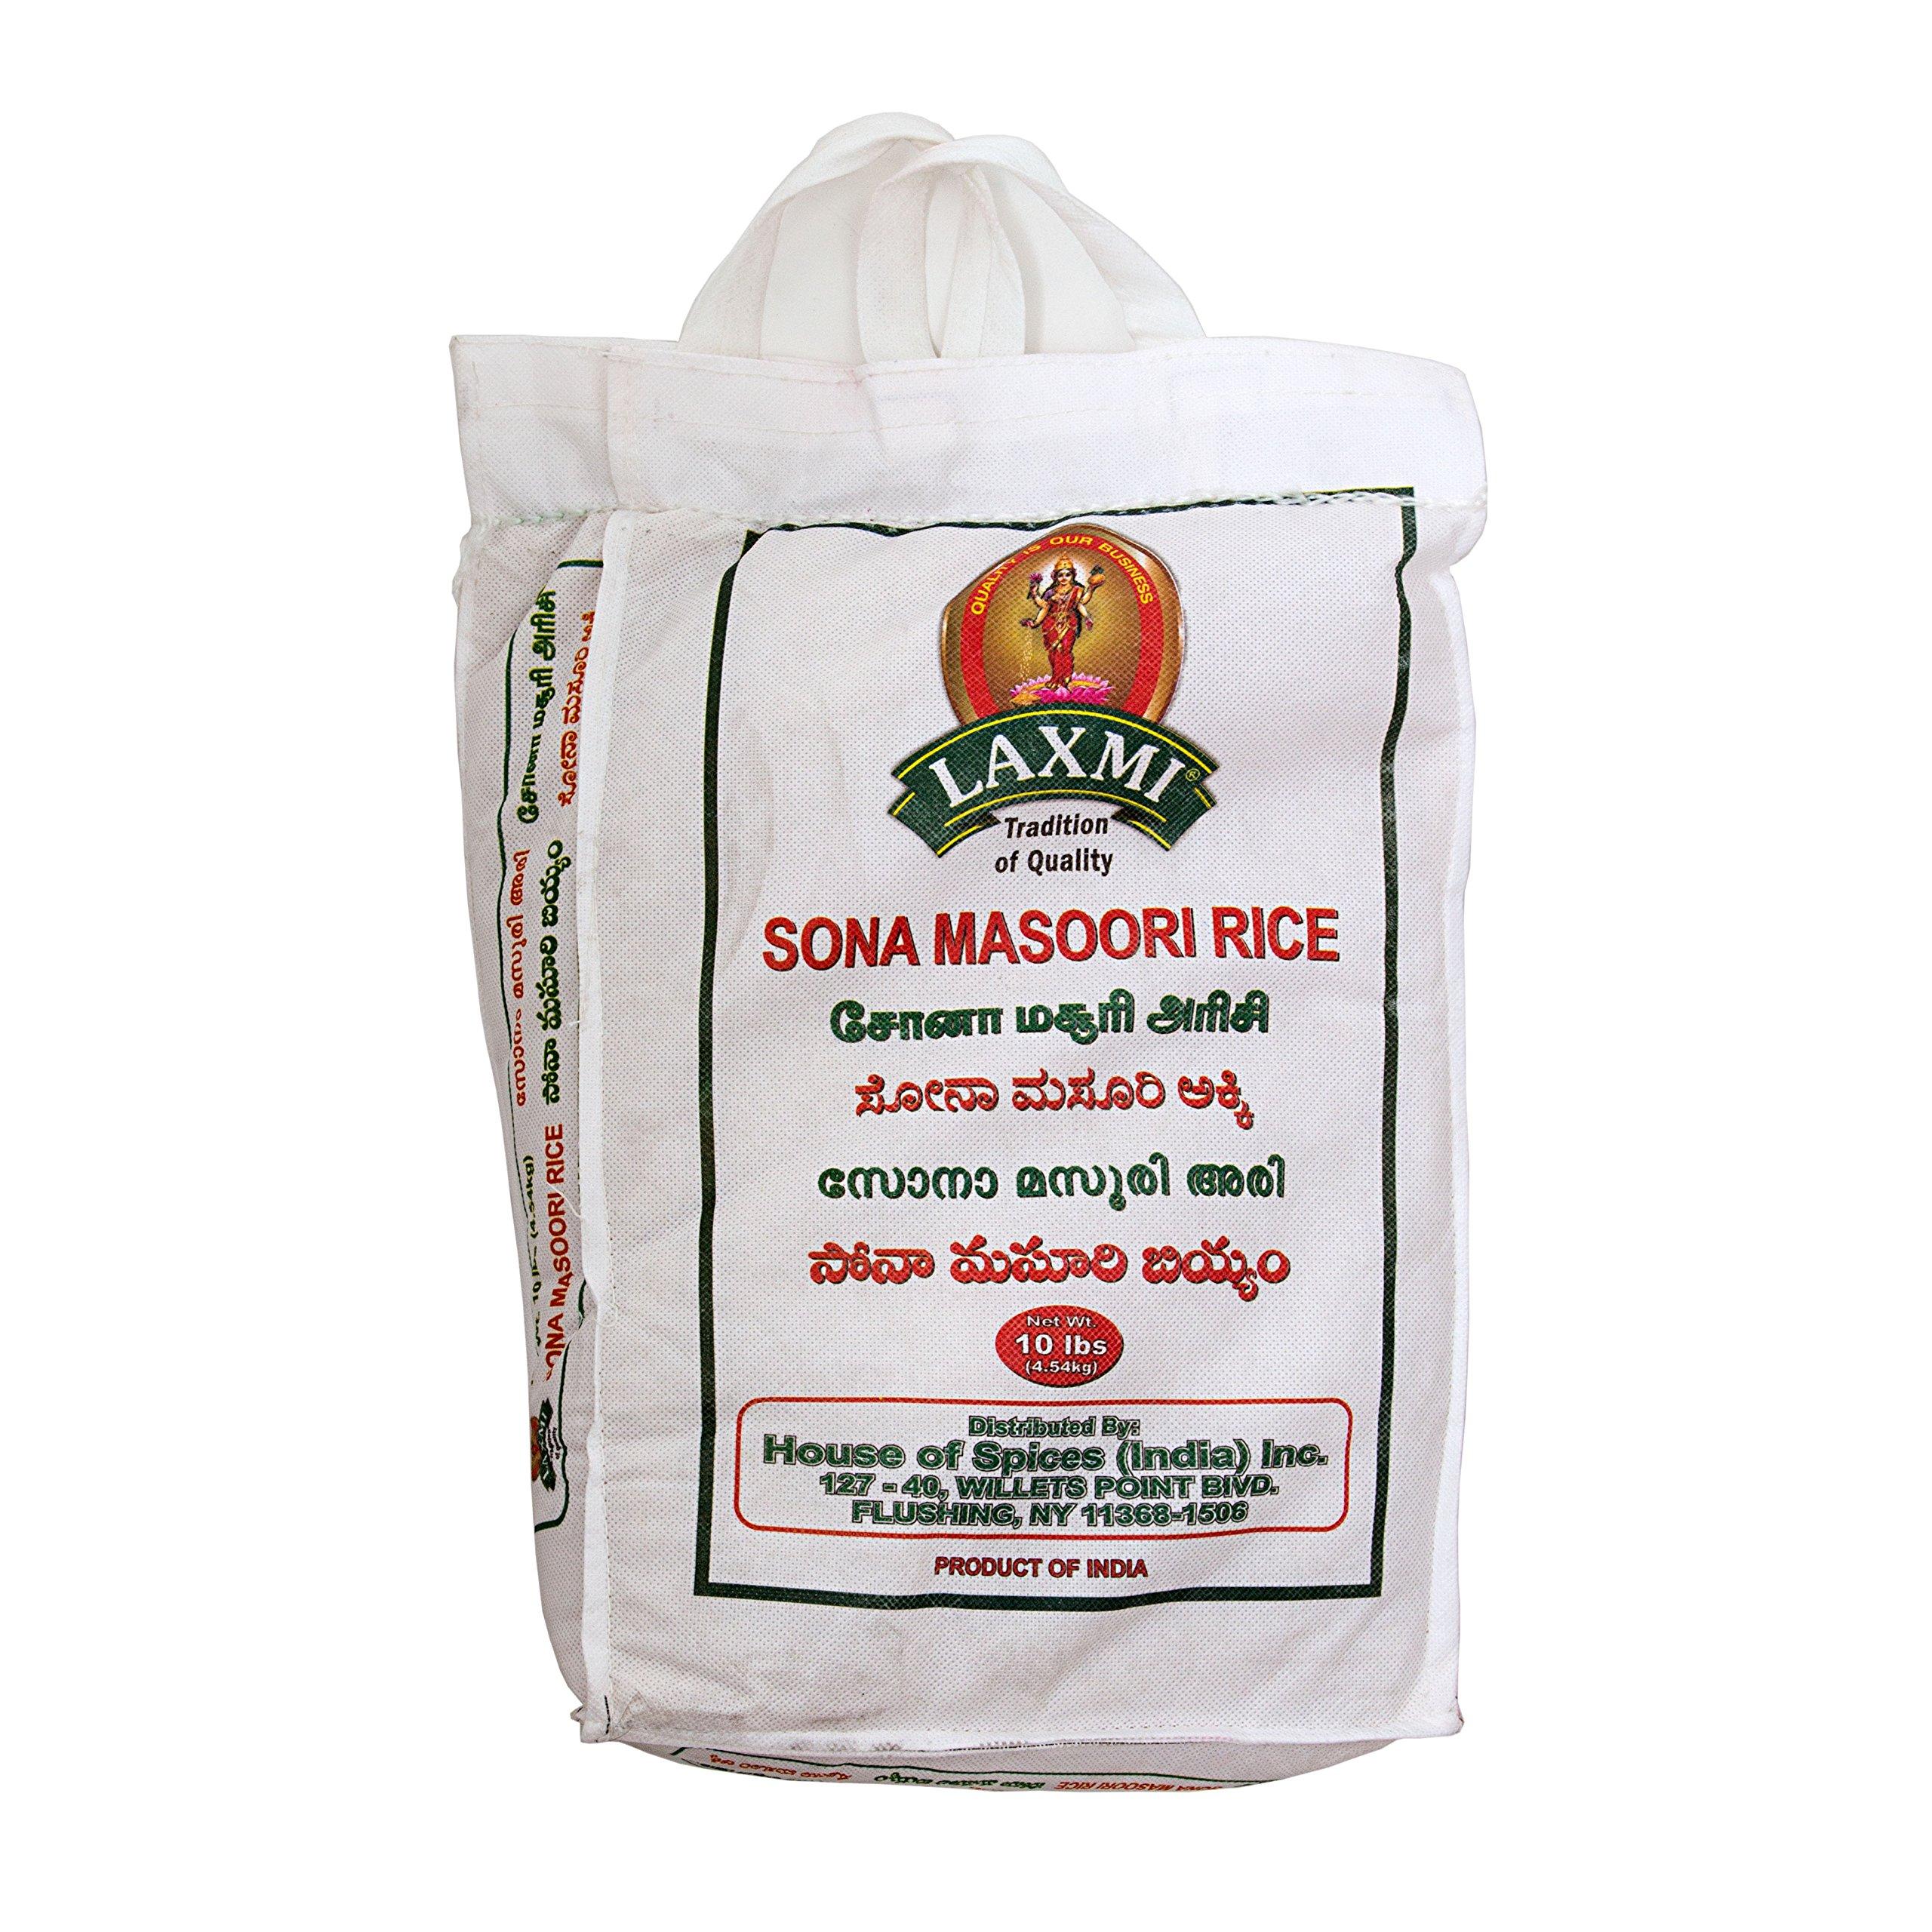 Laxmi Sona Masoori Rice & Laxmi Toor Dal Bundle - (10lb Rice and 4lb Dal) by Laxmi (Image #4)